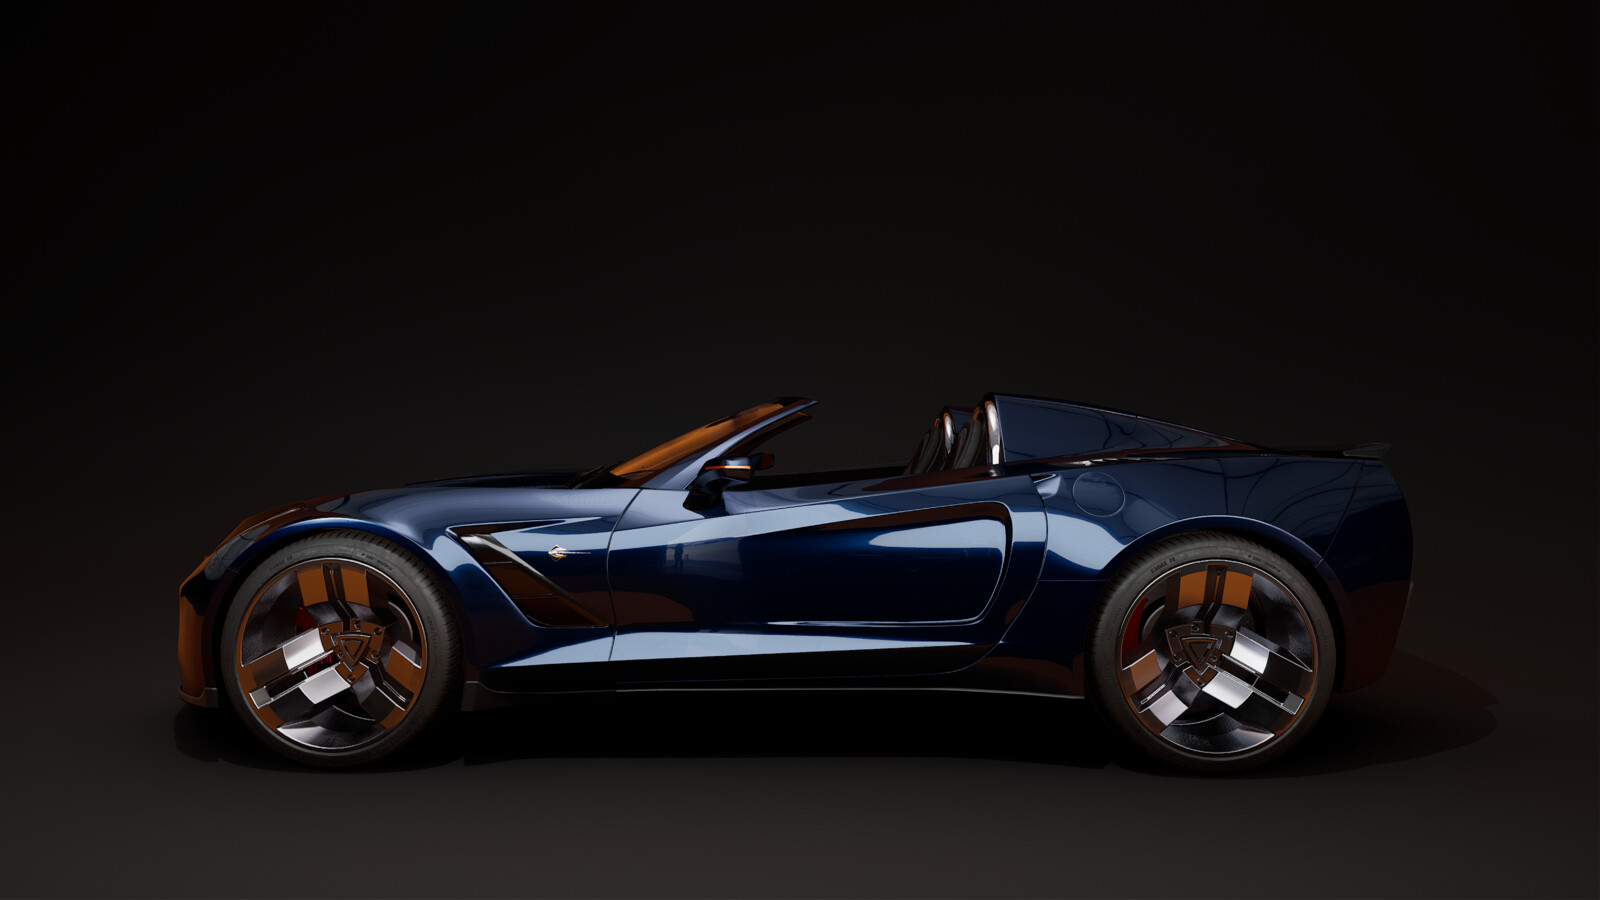 Corvette Stingray Z51 - one more time